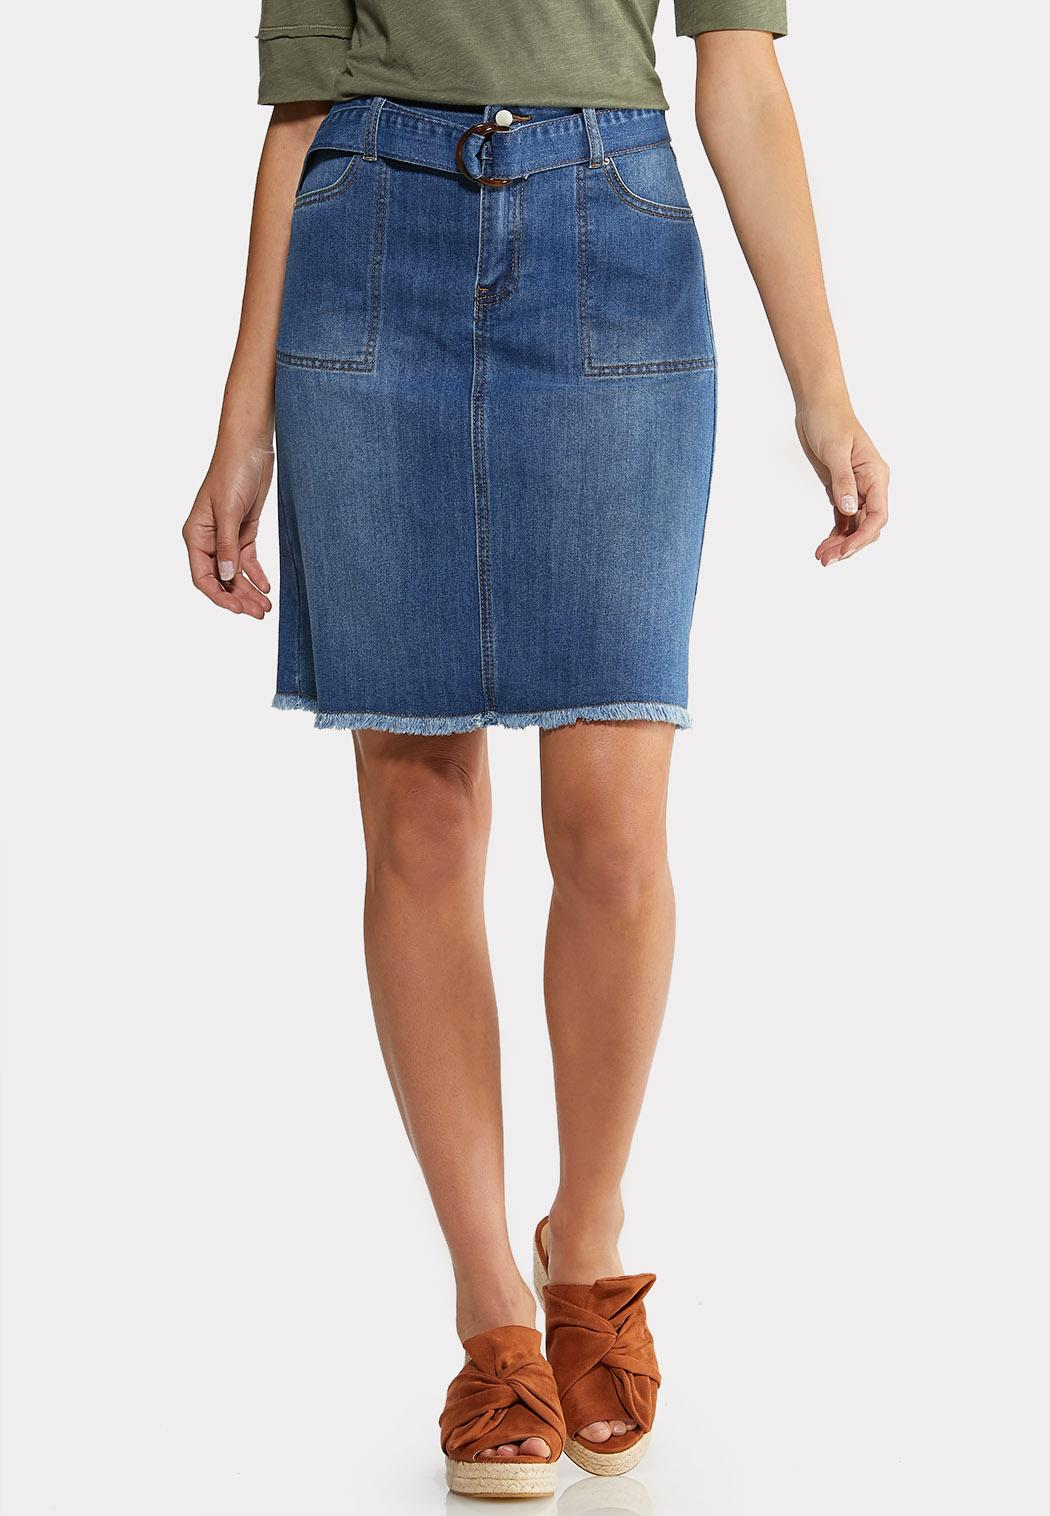 a7f8dc38d Tortoise Belt Frayed Denim Skirt Skirts Cato Fashions